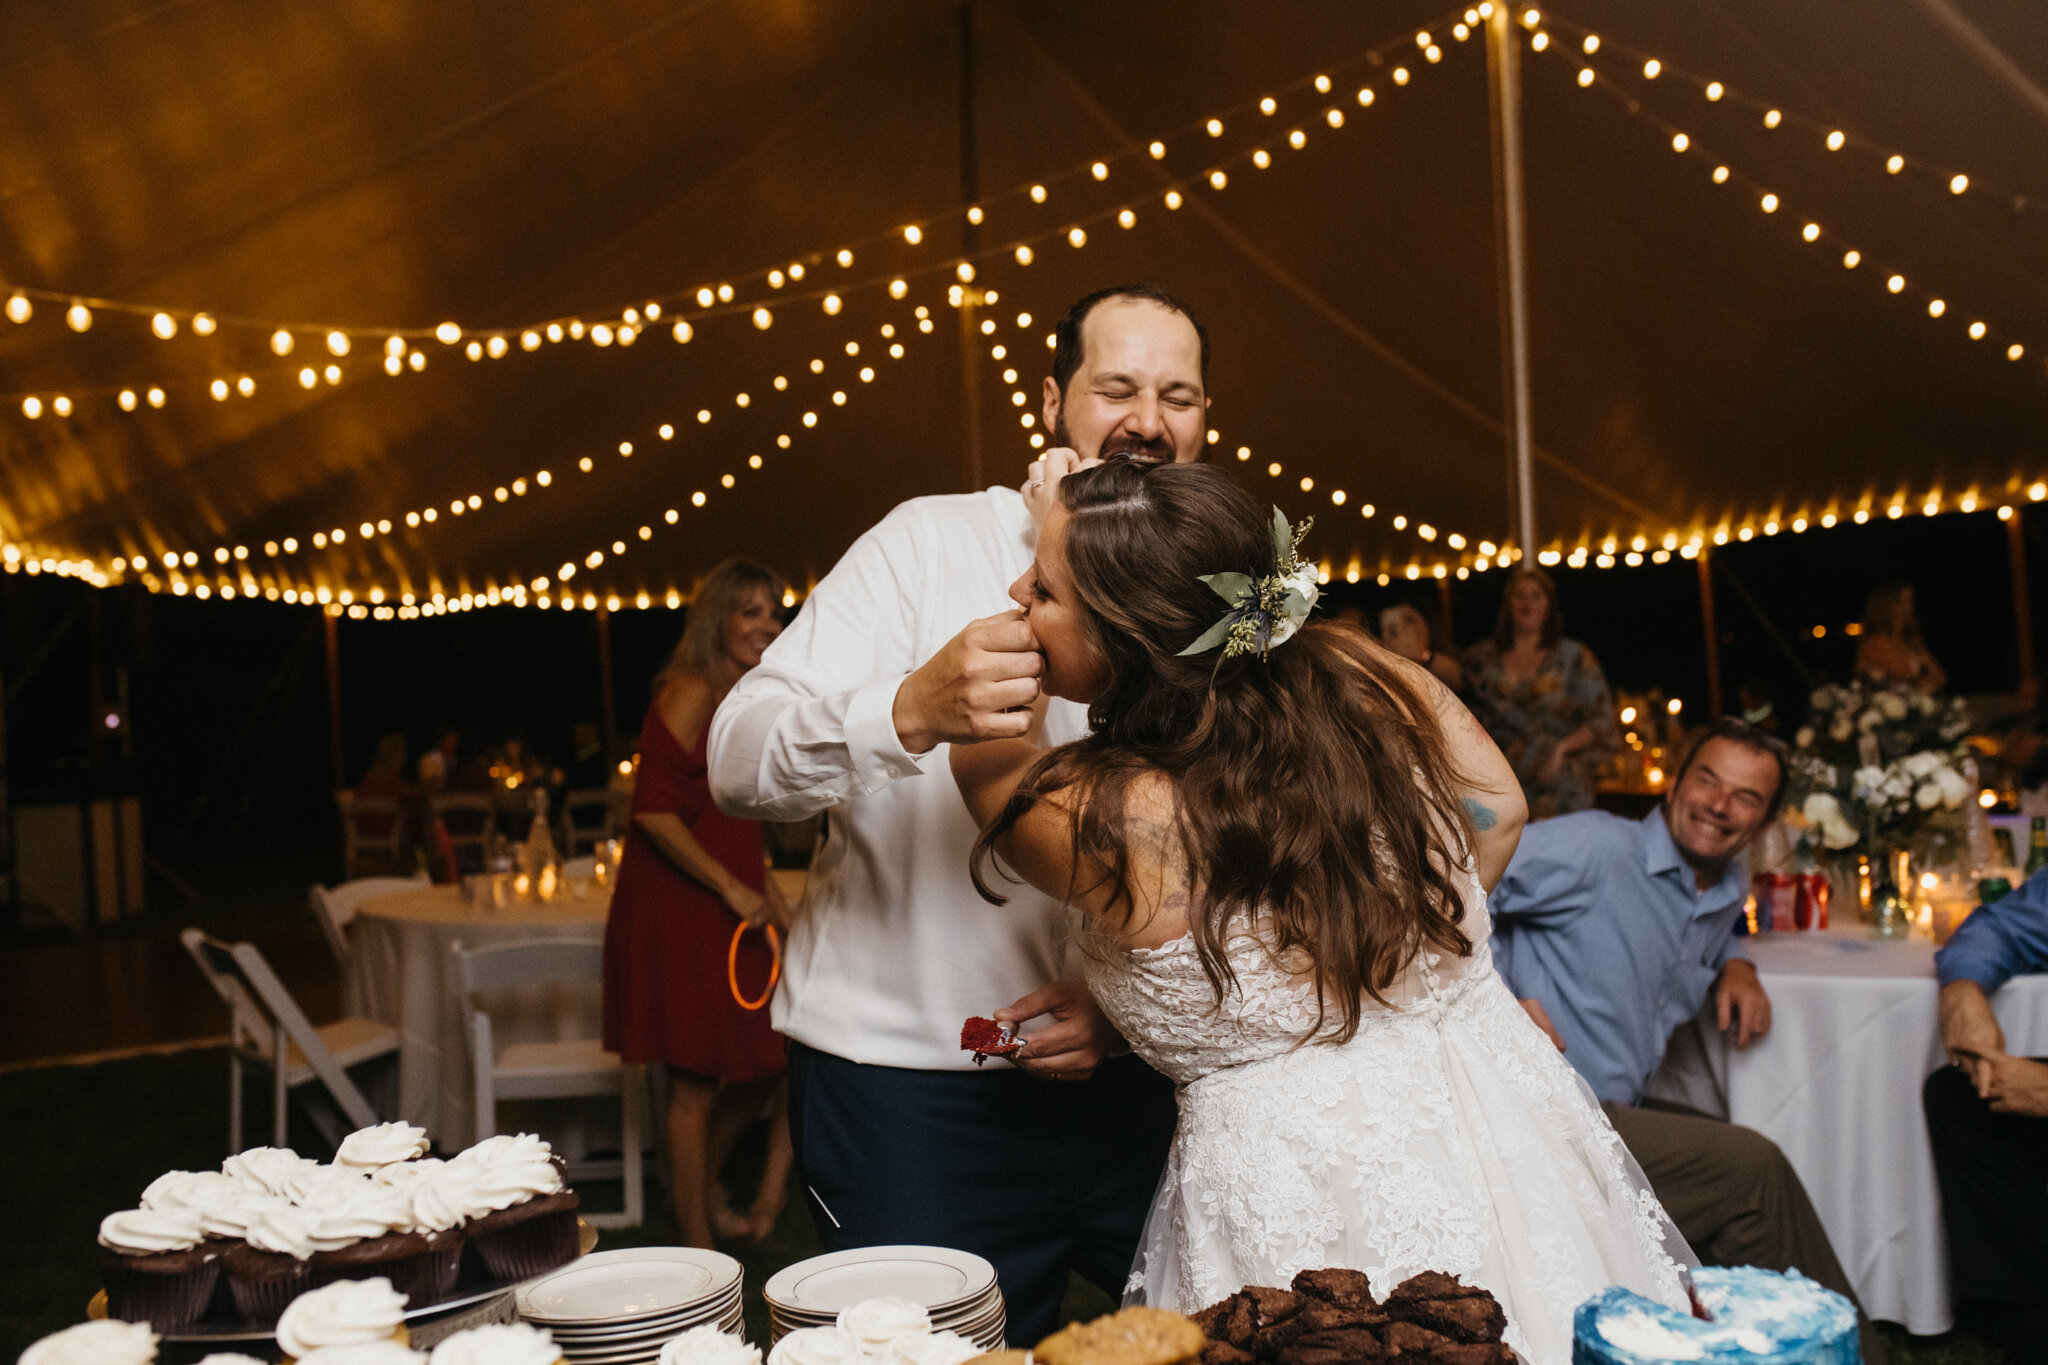 angela_jason_norfolk_wedding-181.jpg